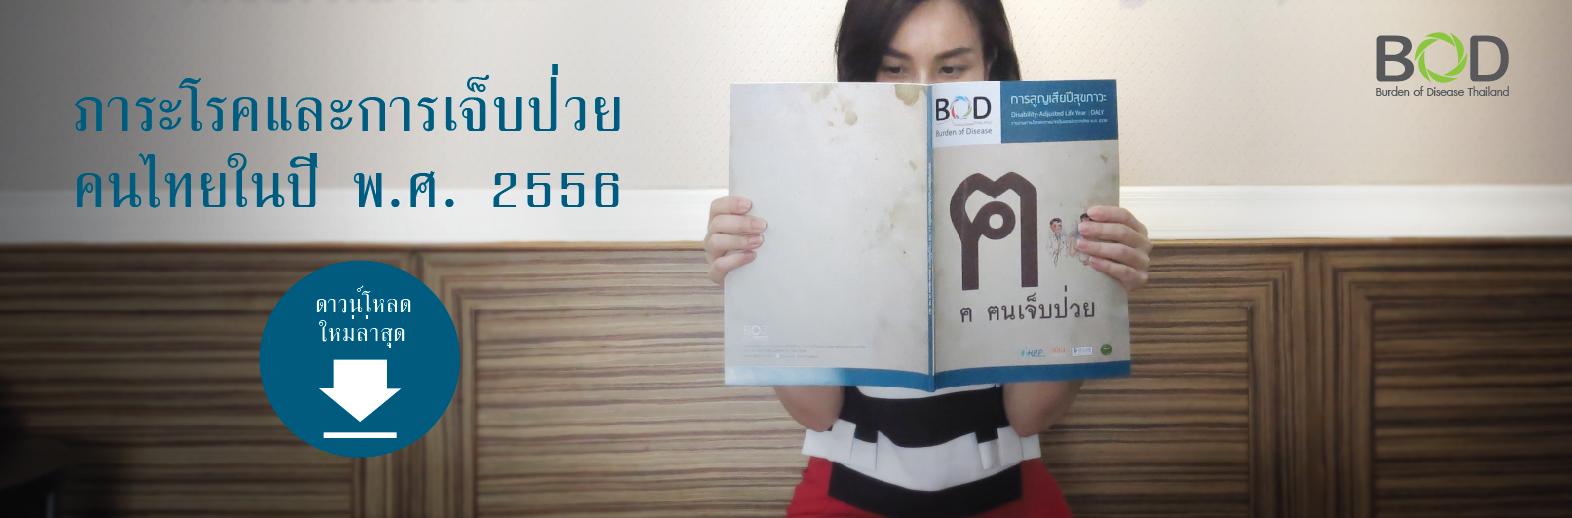 Banner-BOD-05